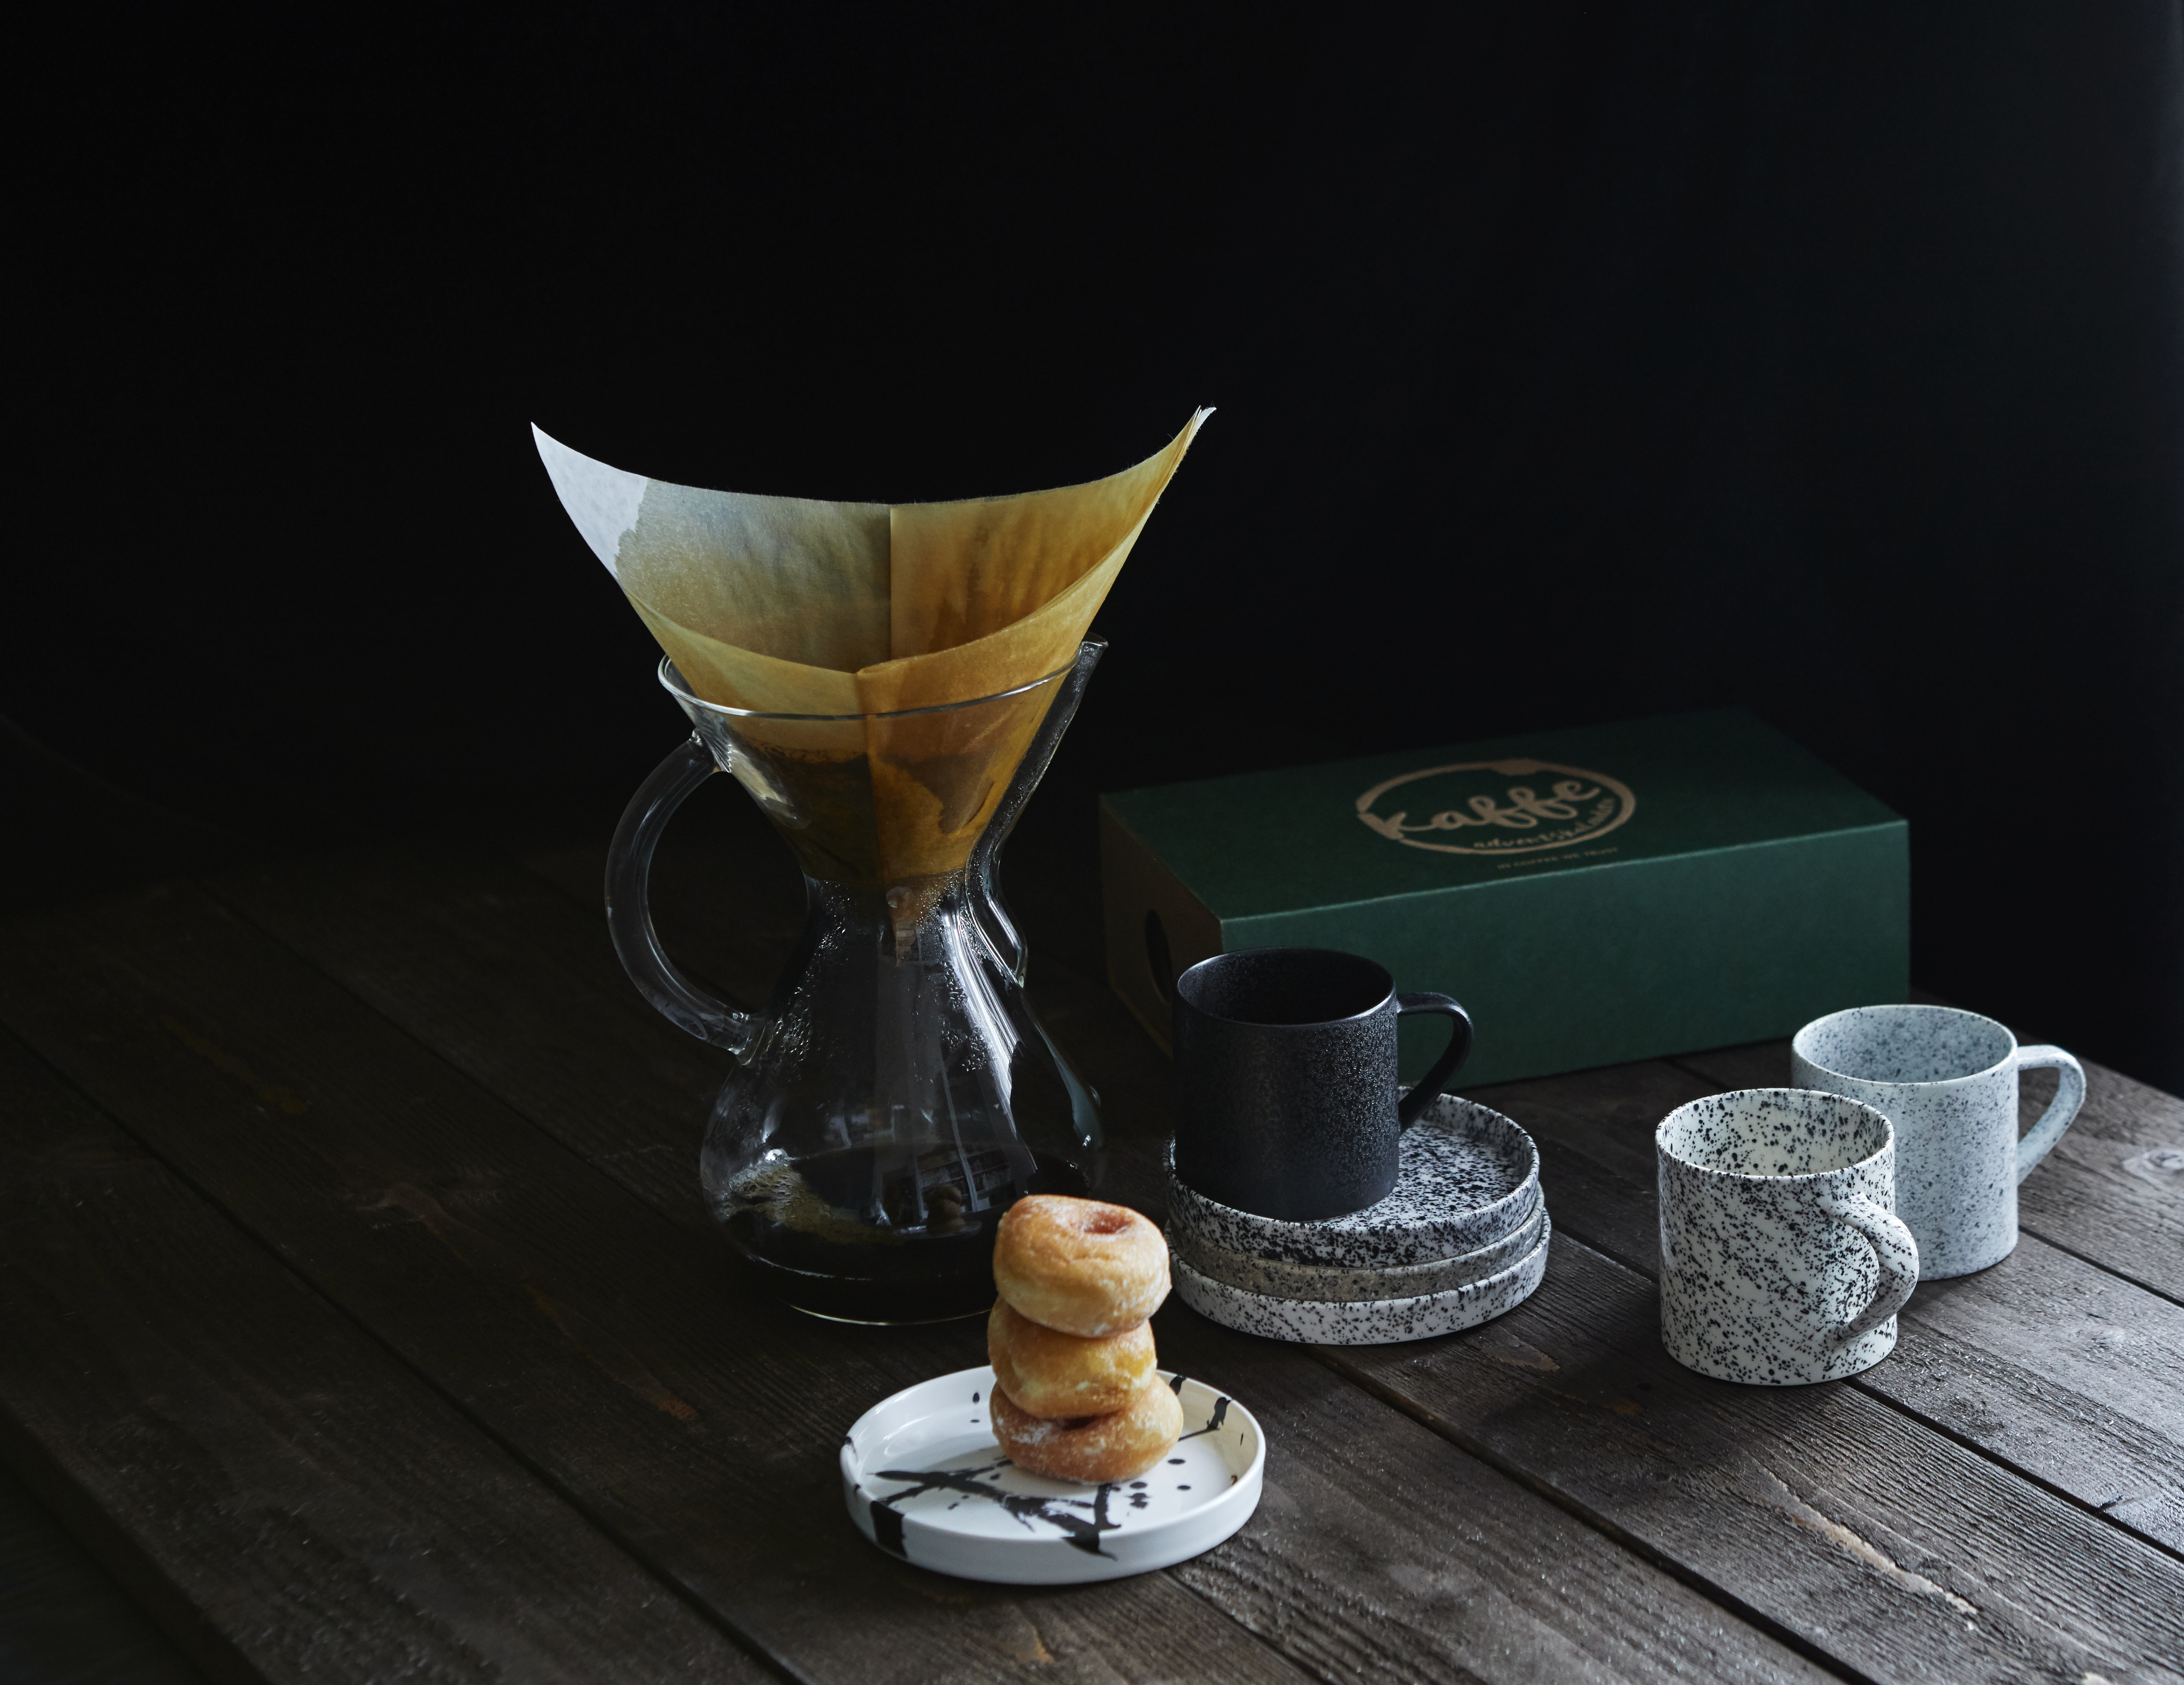 kaffeadventskalendern kaffets dag 2018